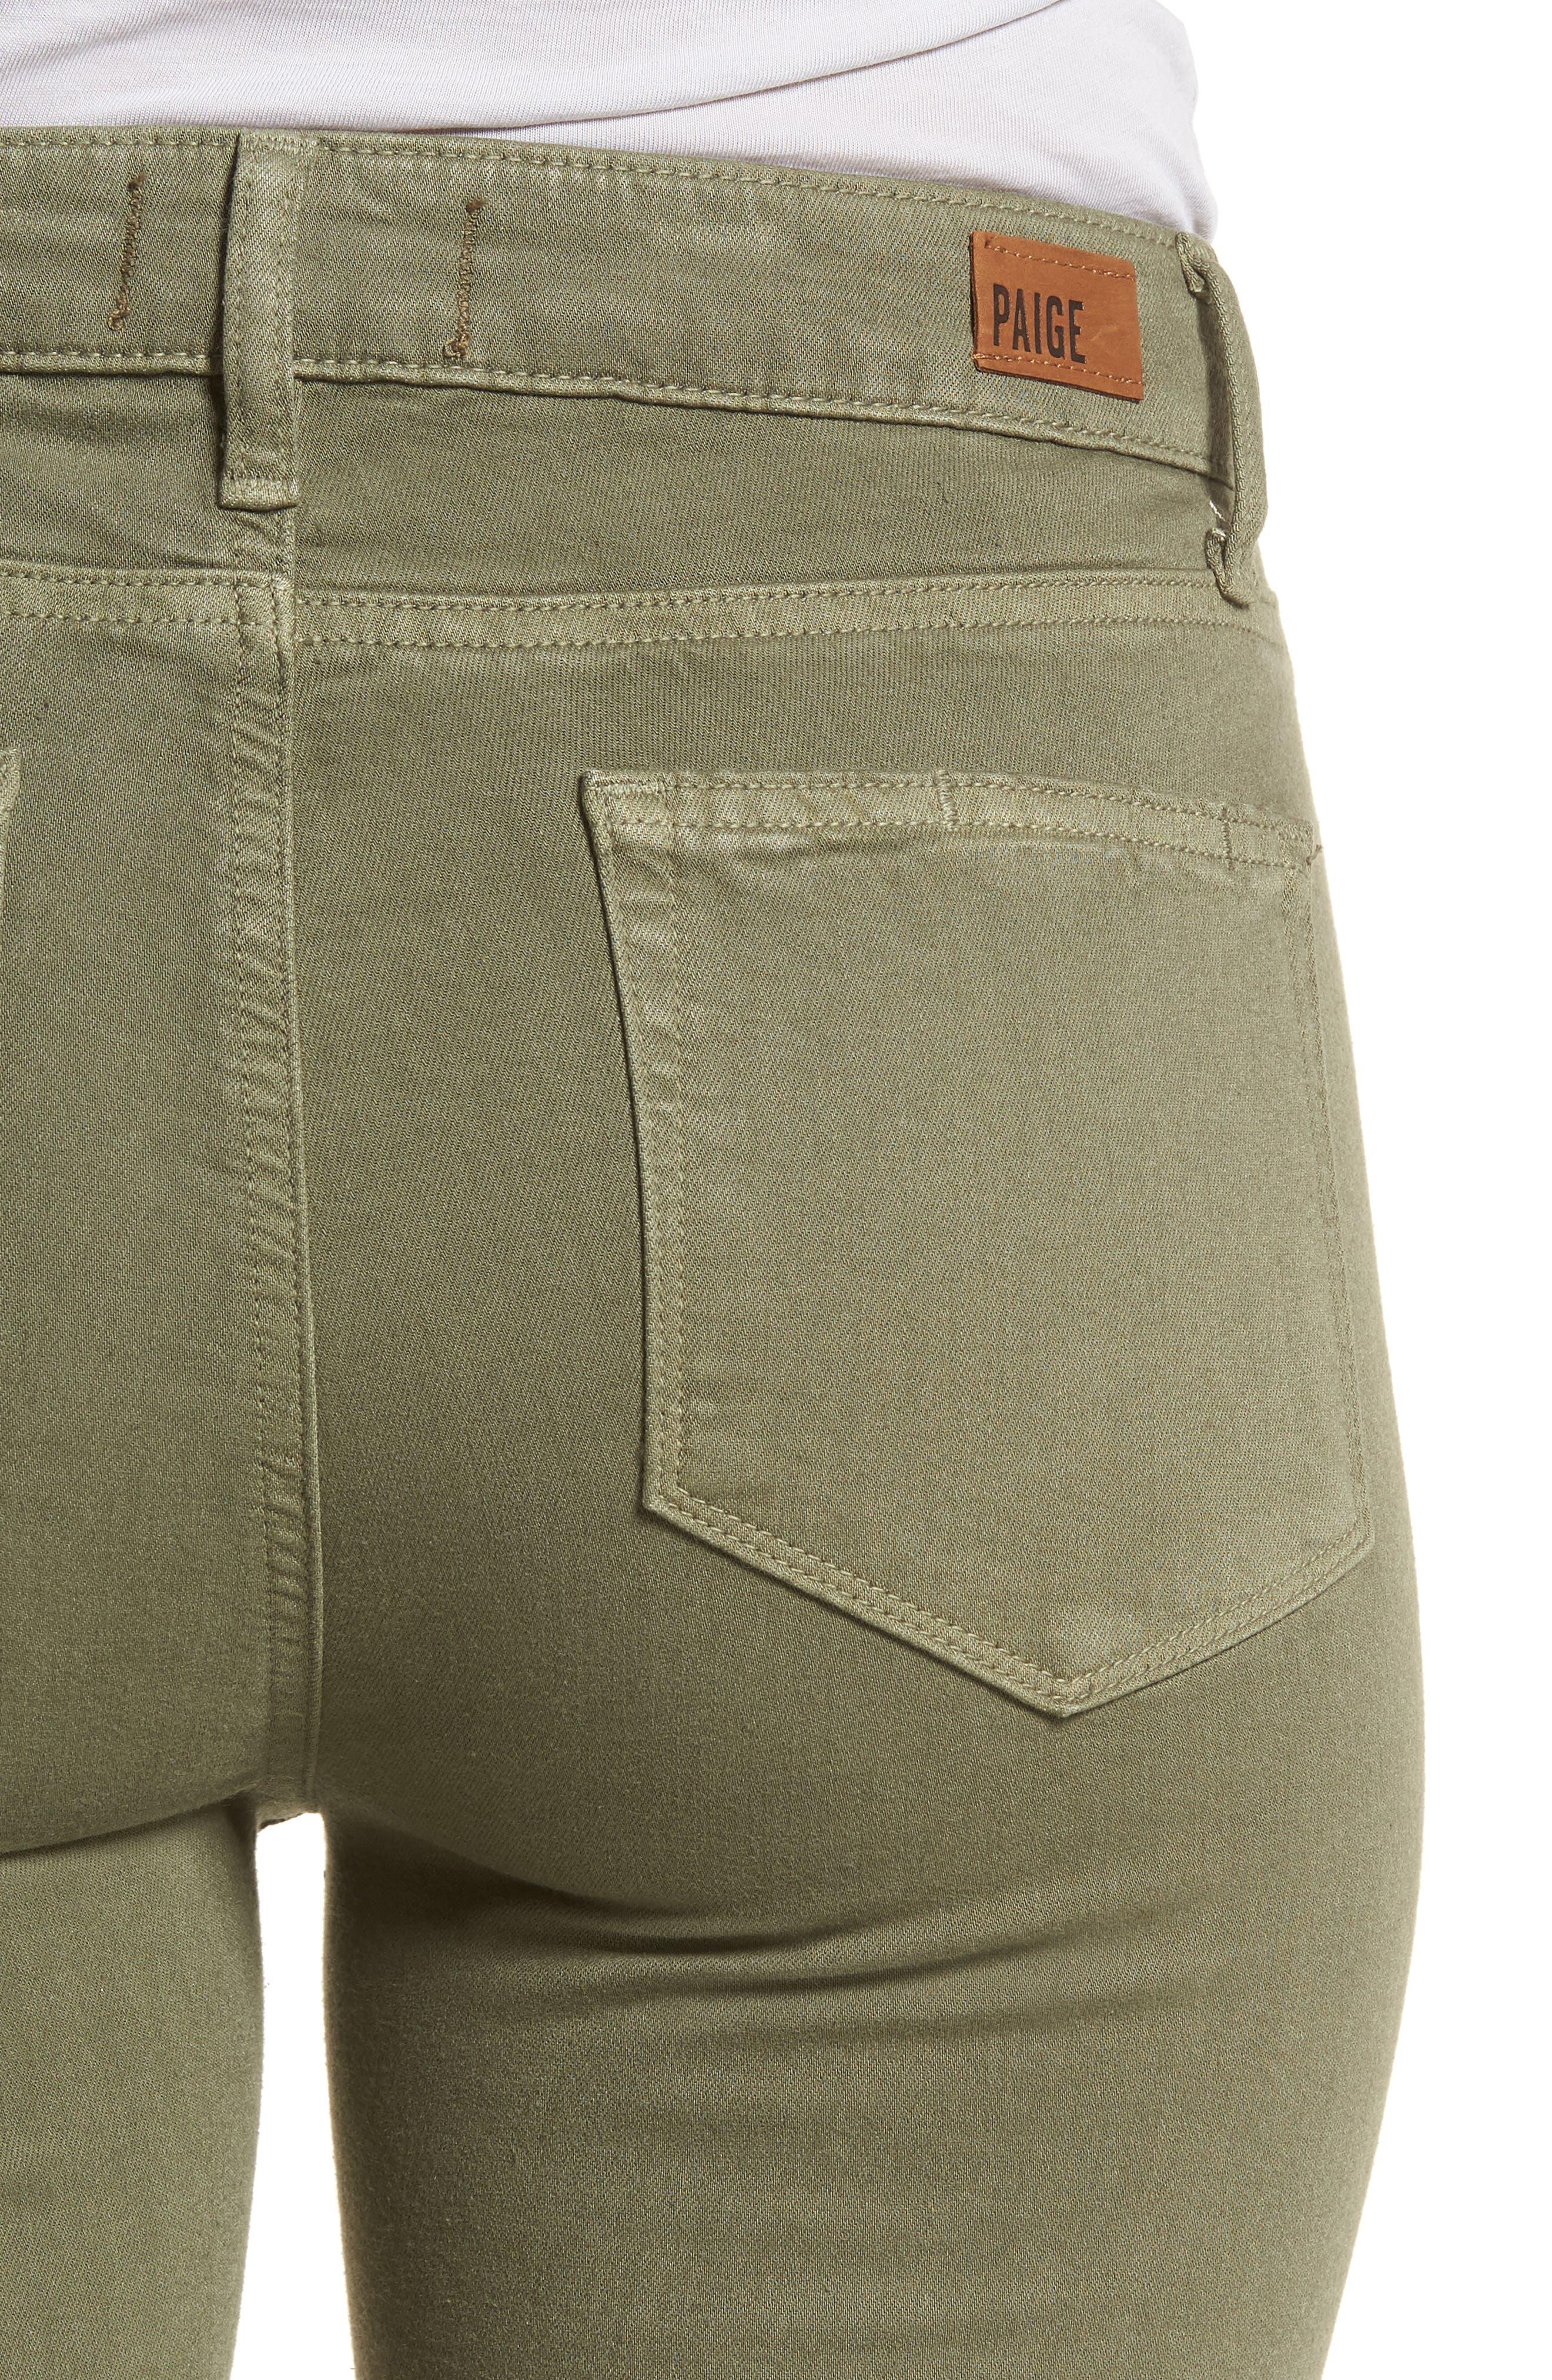 Hoxton High Waist Crop Skinny Jeans,                             Alternate thumbnail 4, color,                             Vintage Green